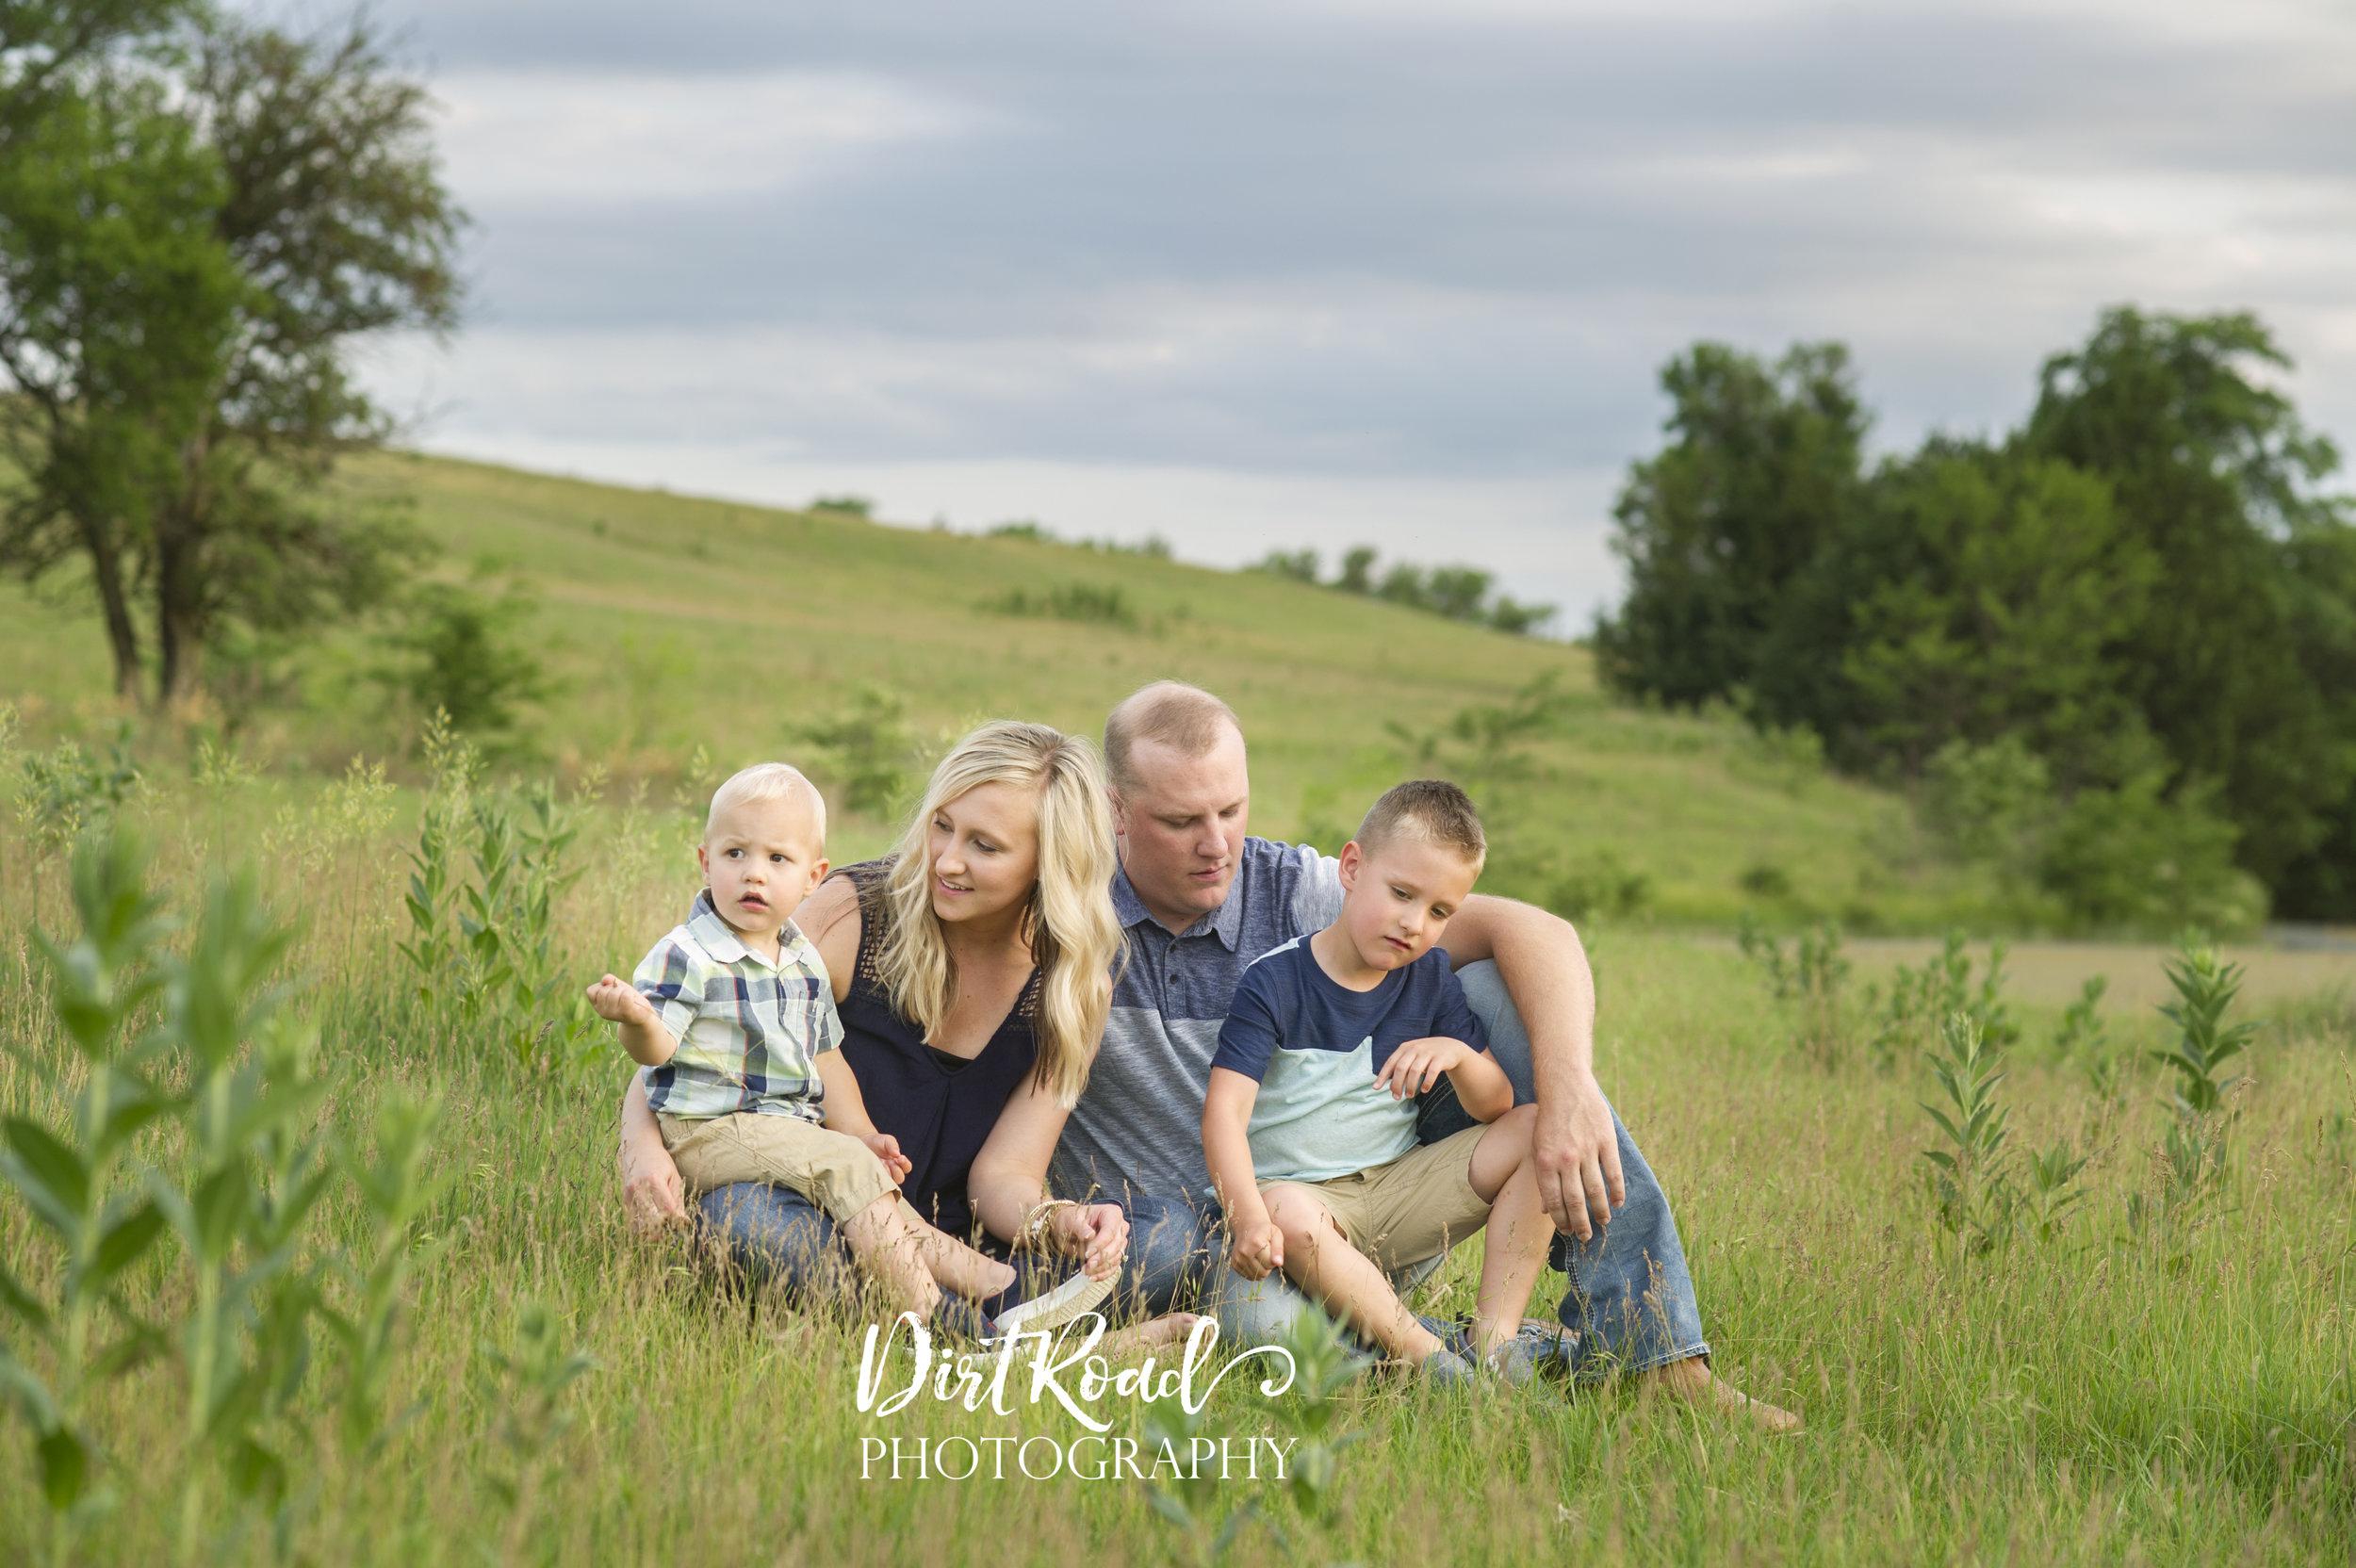 nebraskaphotographerfamilysession